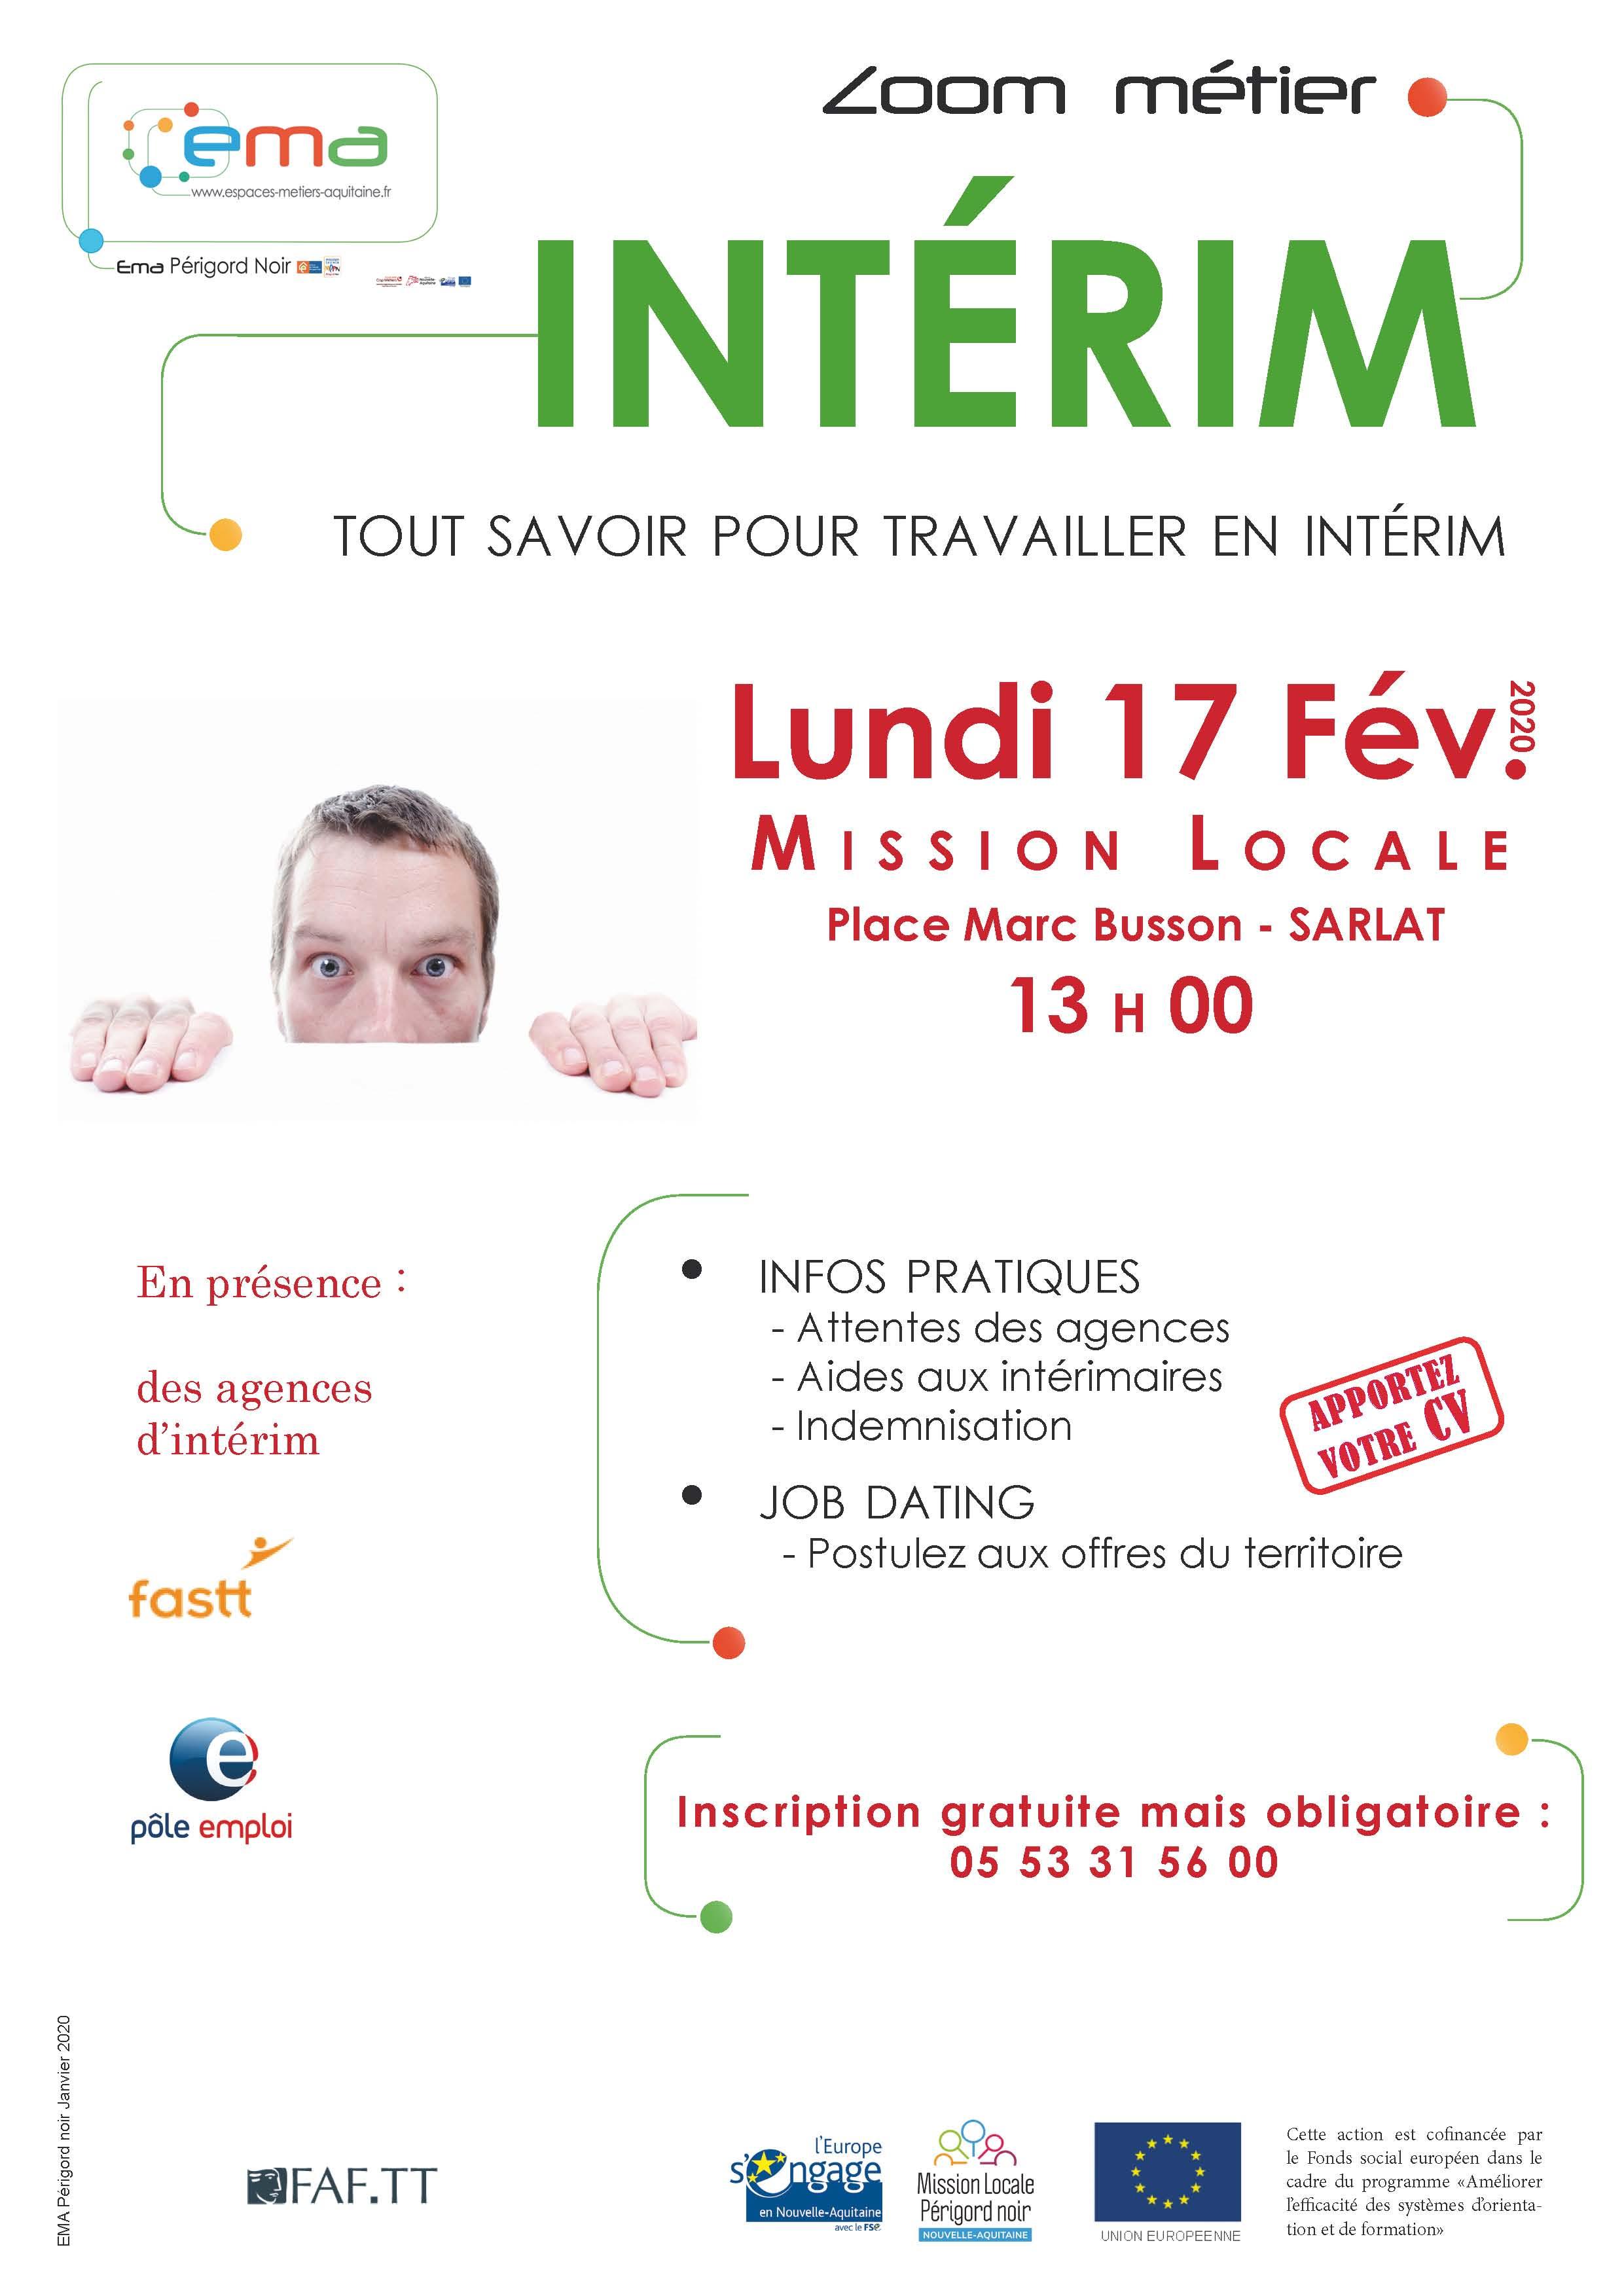 interim-zoom-17-02-20-Sarlat.jpg